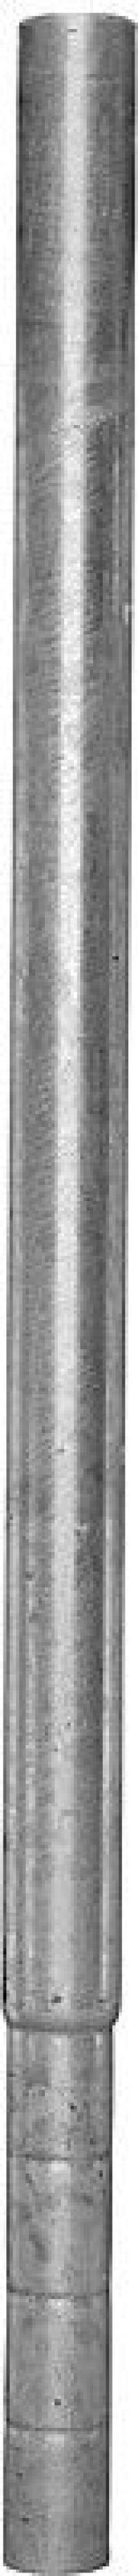 Paal d= 102 mm, L= 1,65 mvoor roostervloer